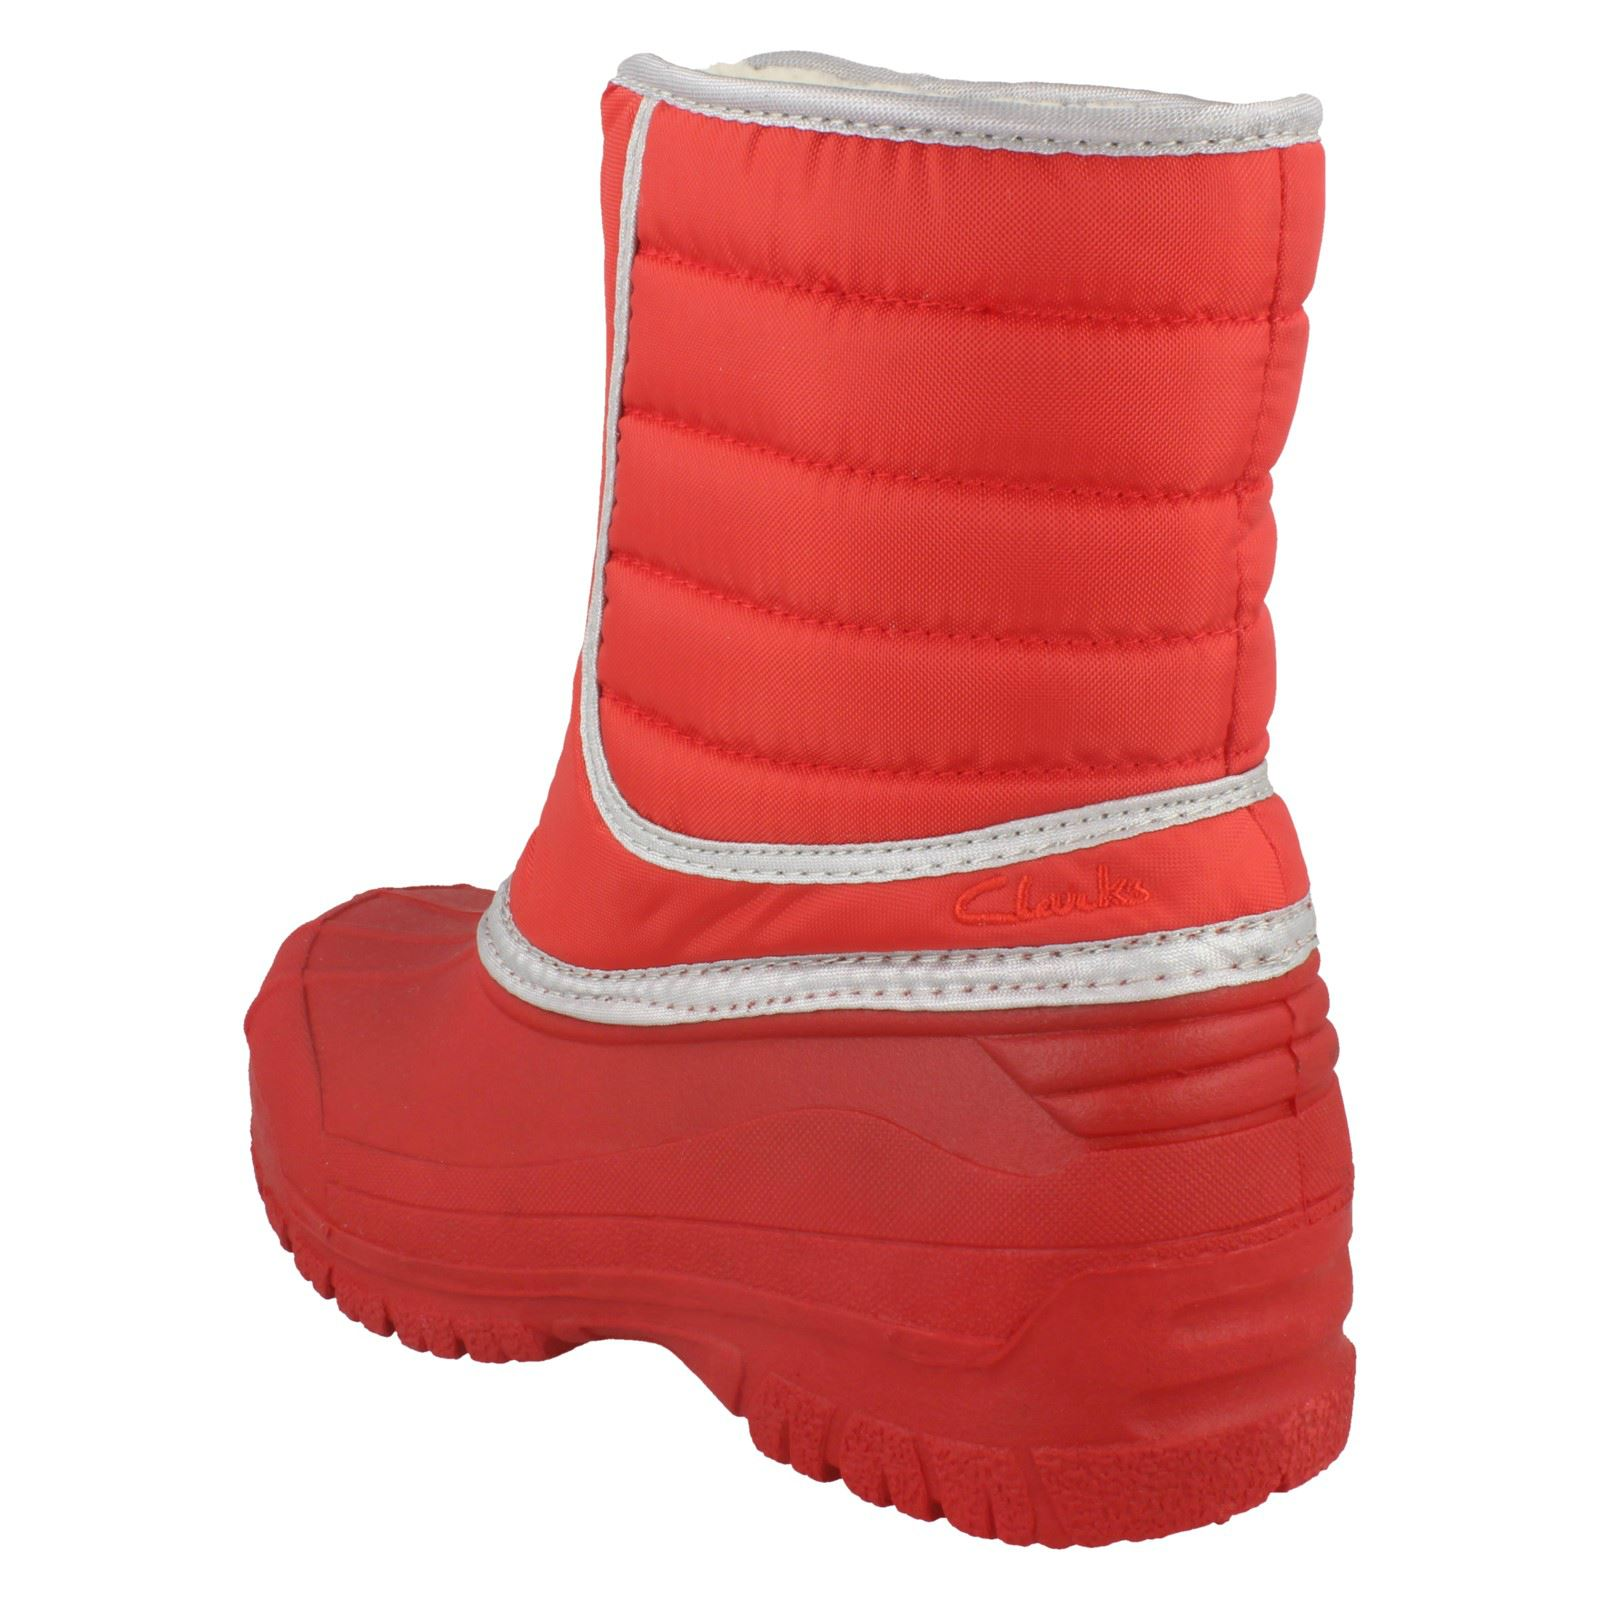 Clarks Botas niñas de trail' 'snow rojo para nieve POIwrqZO